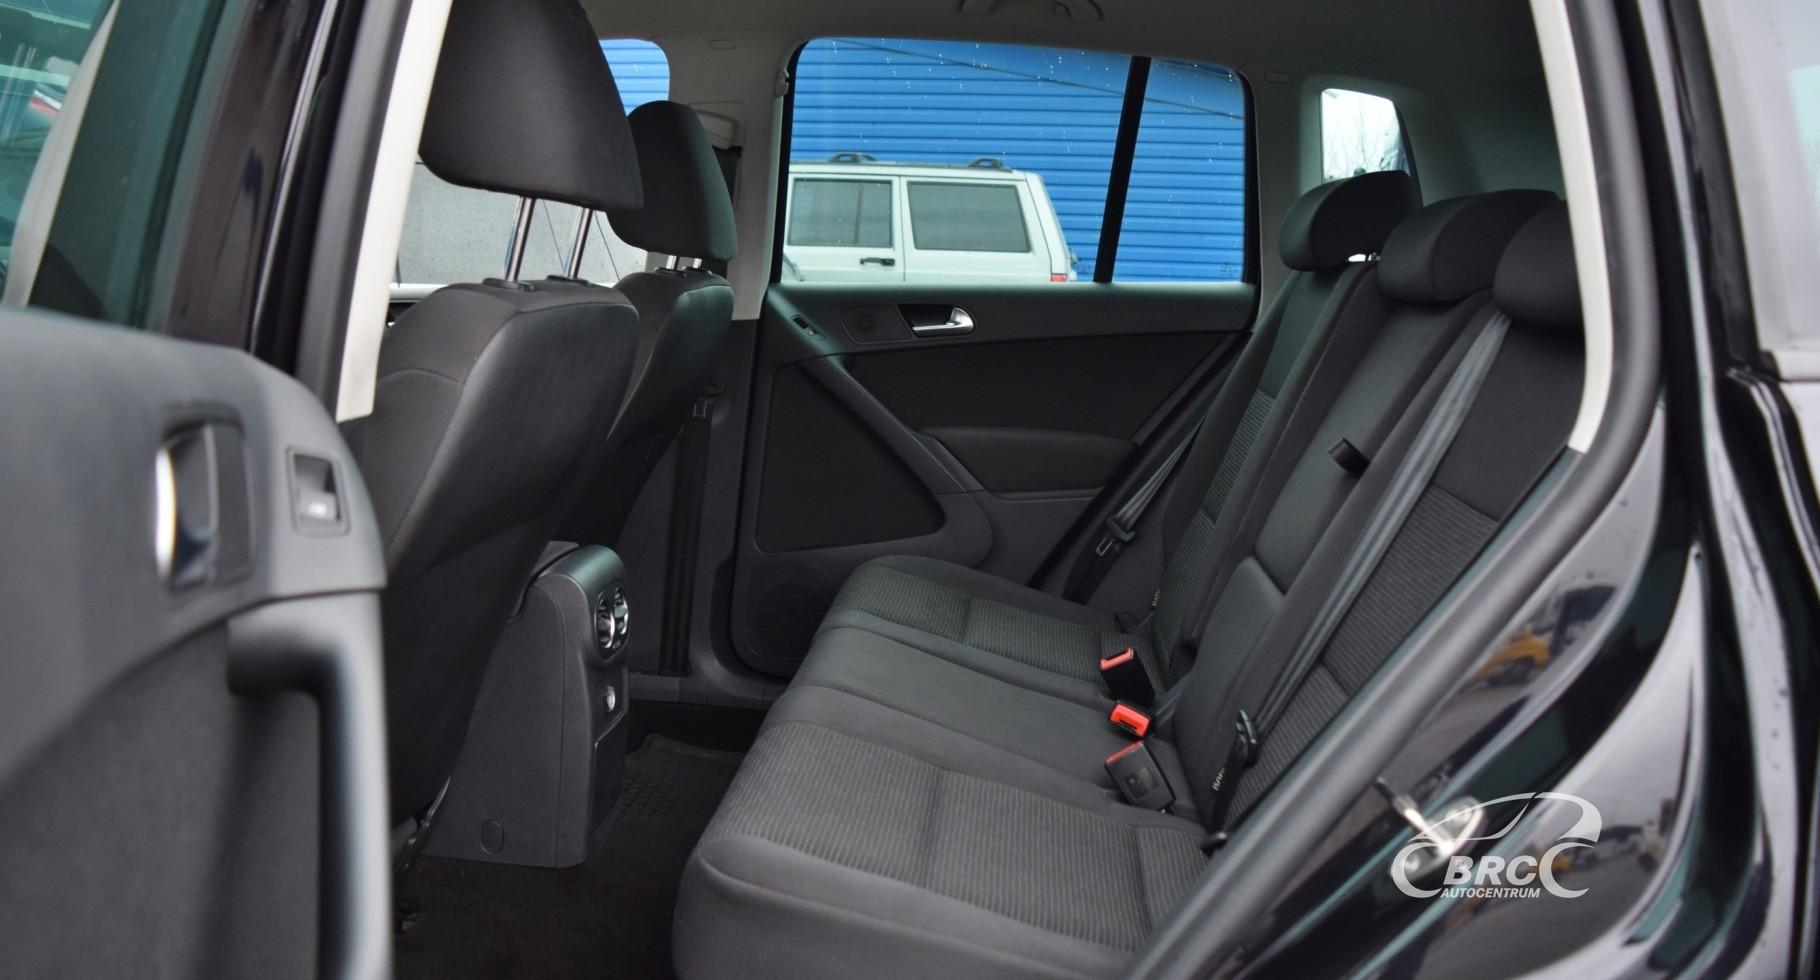 Volkswagen Tiguan TDi Bluemotion M/T